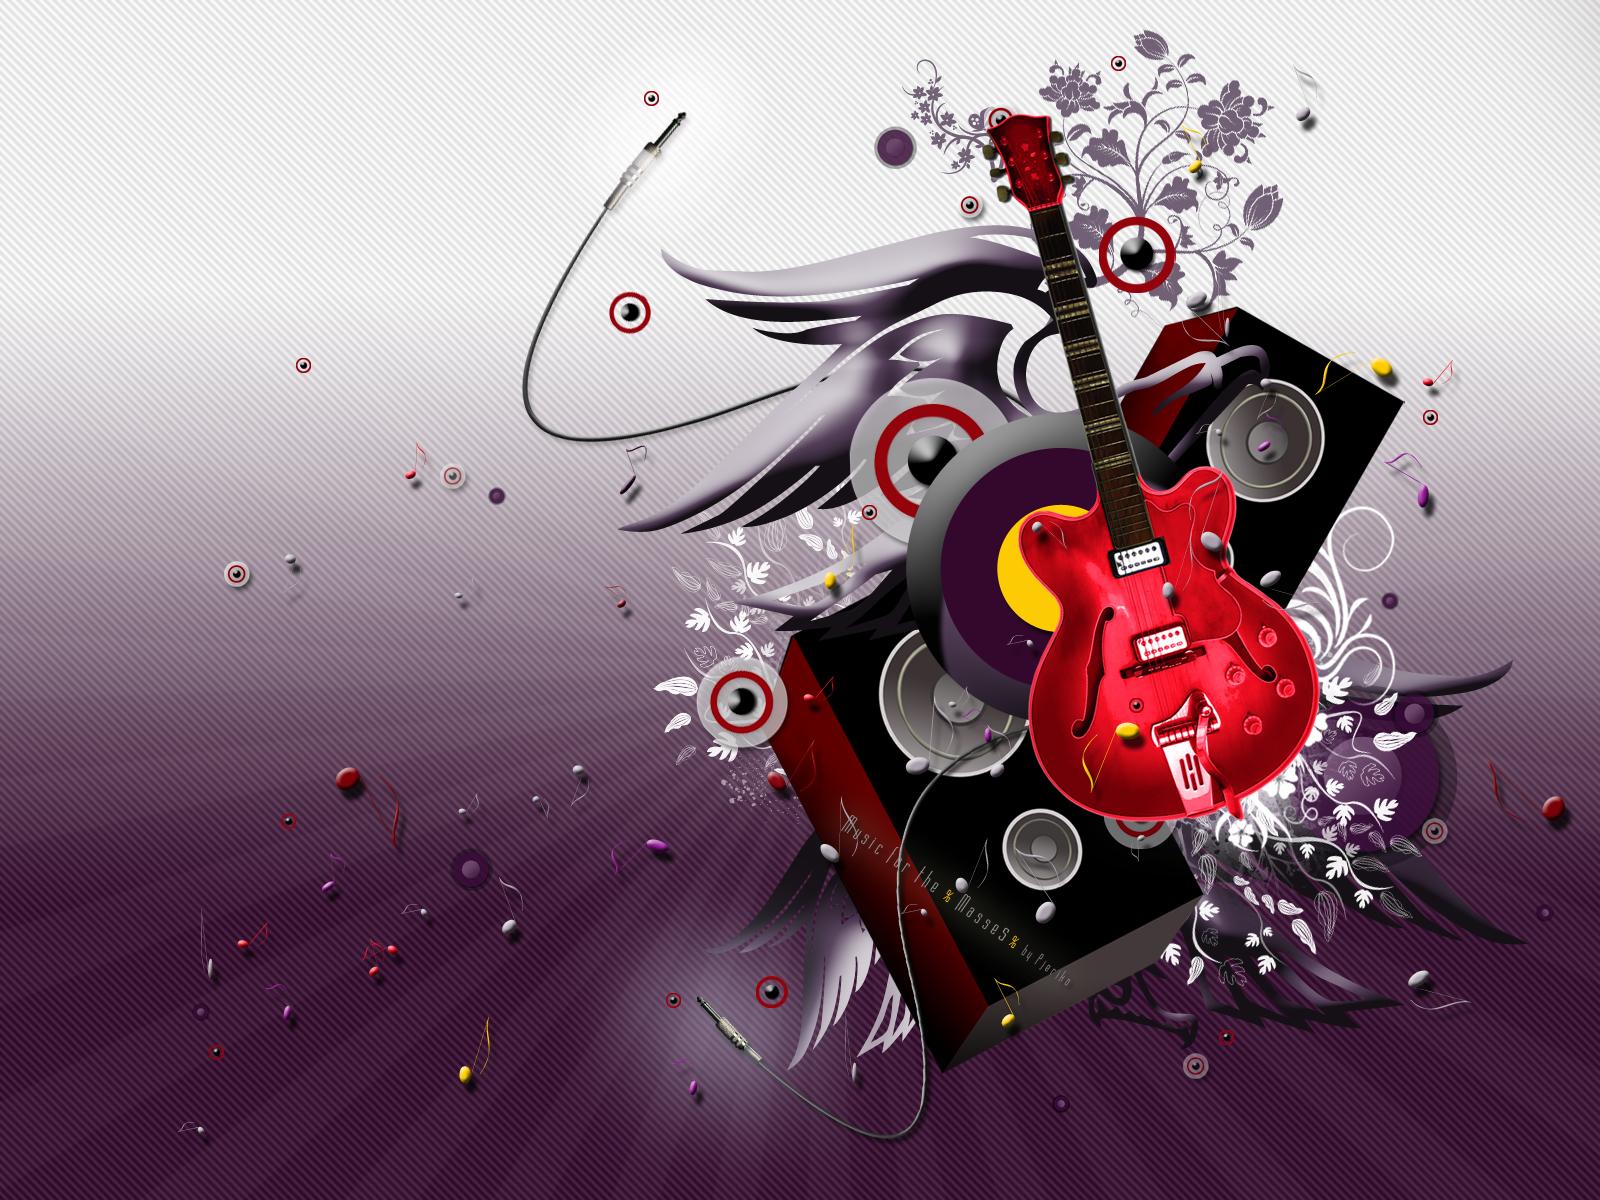 http://3.bp.blogspot.com/-s2eCHVj88sQ/Tu4eh_BeDcI/AAAAAAAAGbE/cYGdK-mKRIo/s1600/Music_for_the_masses_by_Pjeriko.jpg